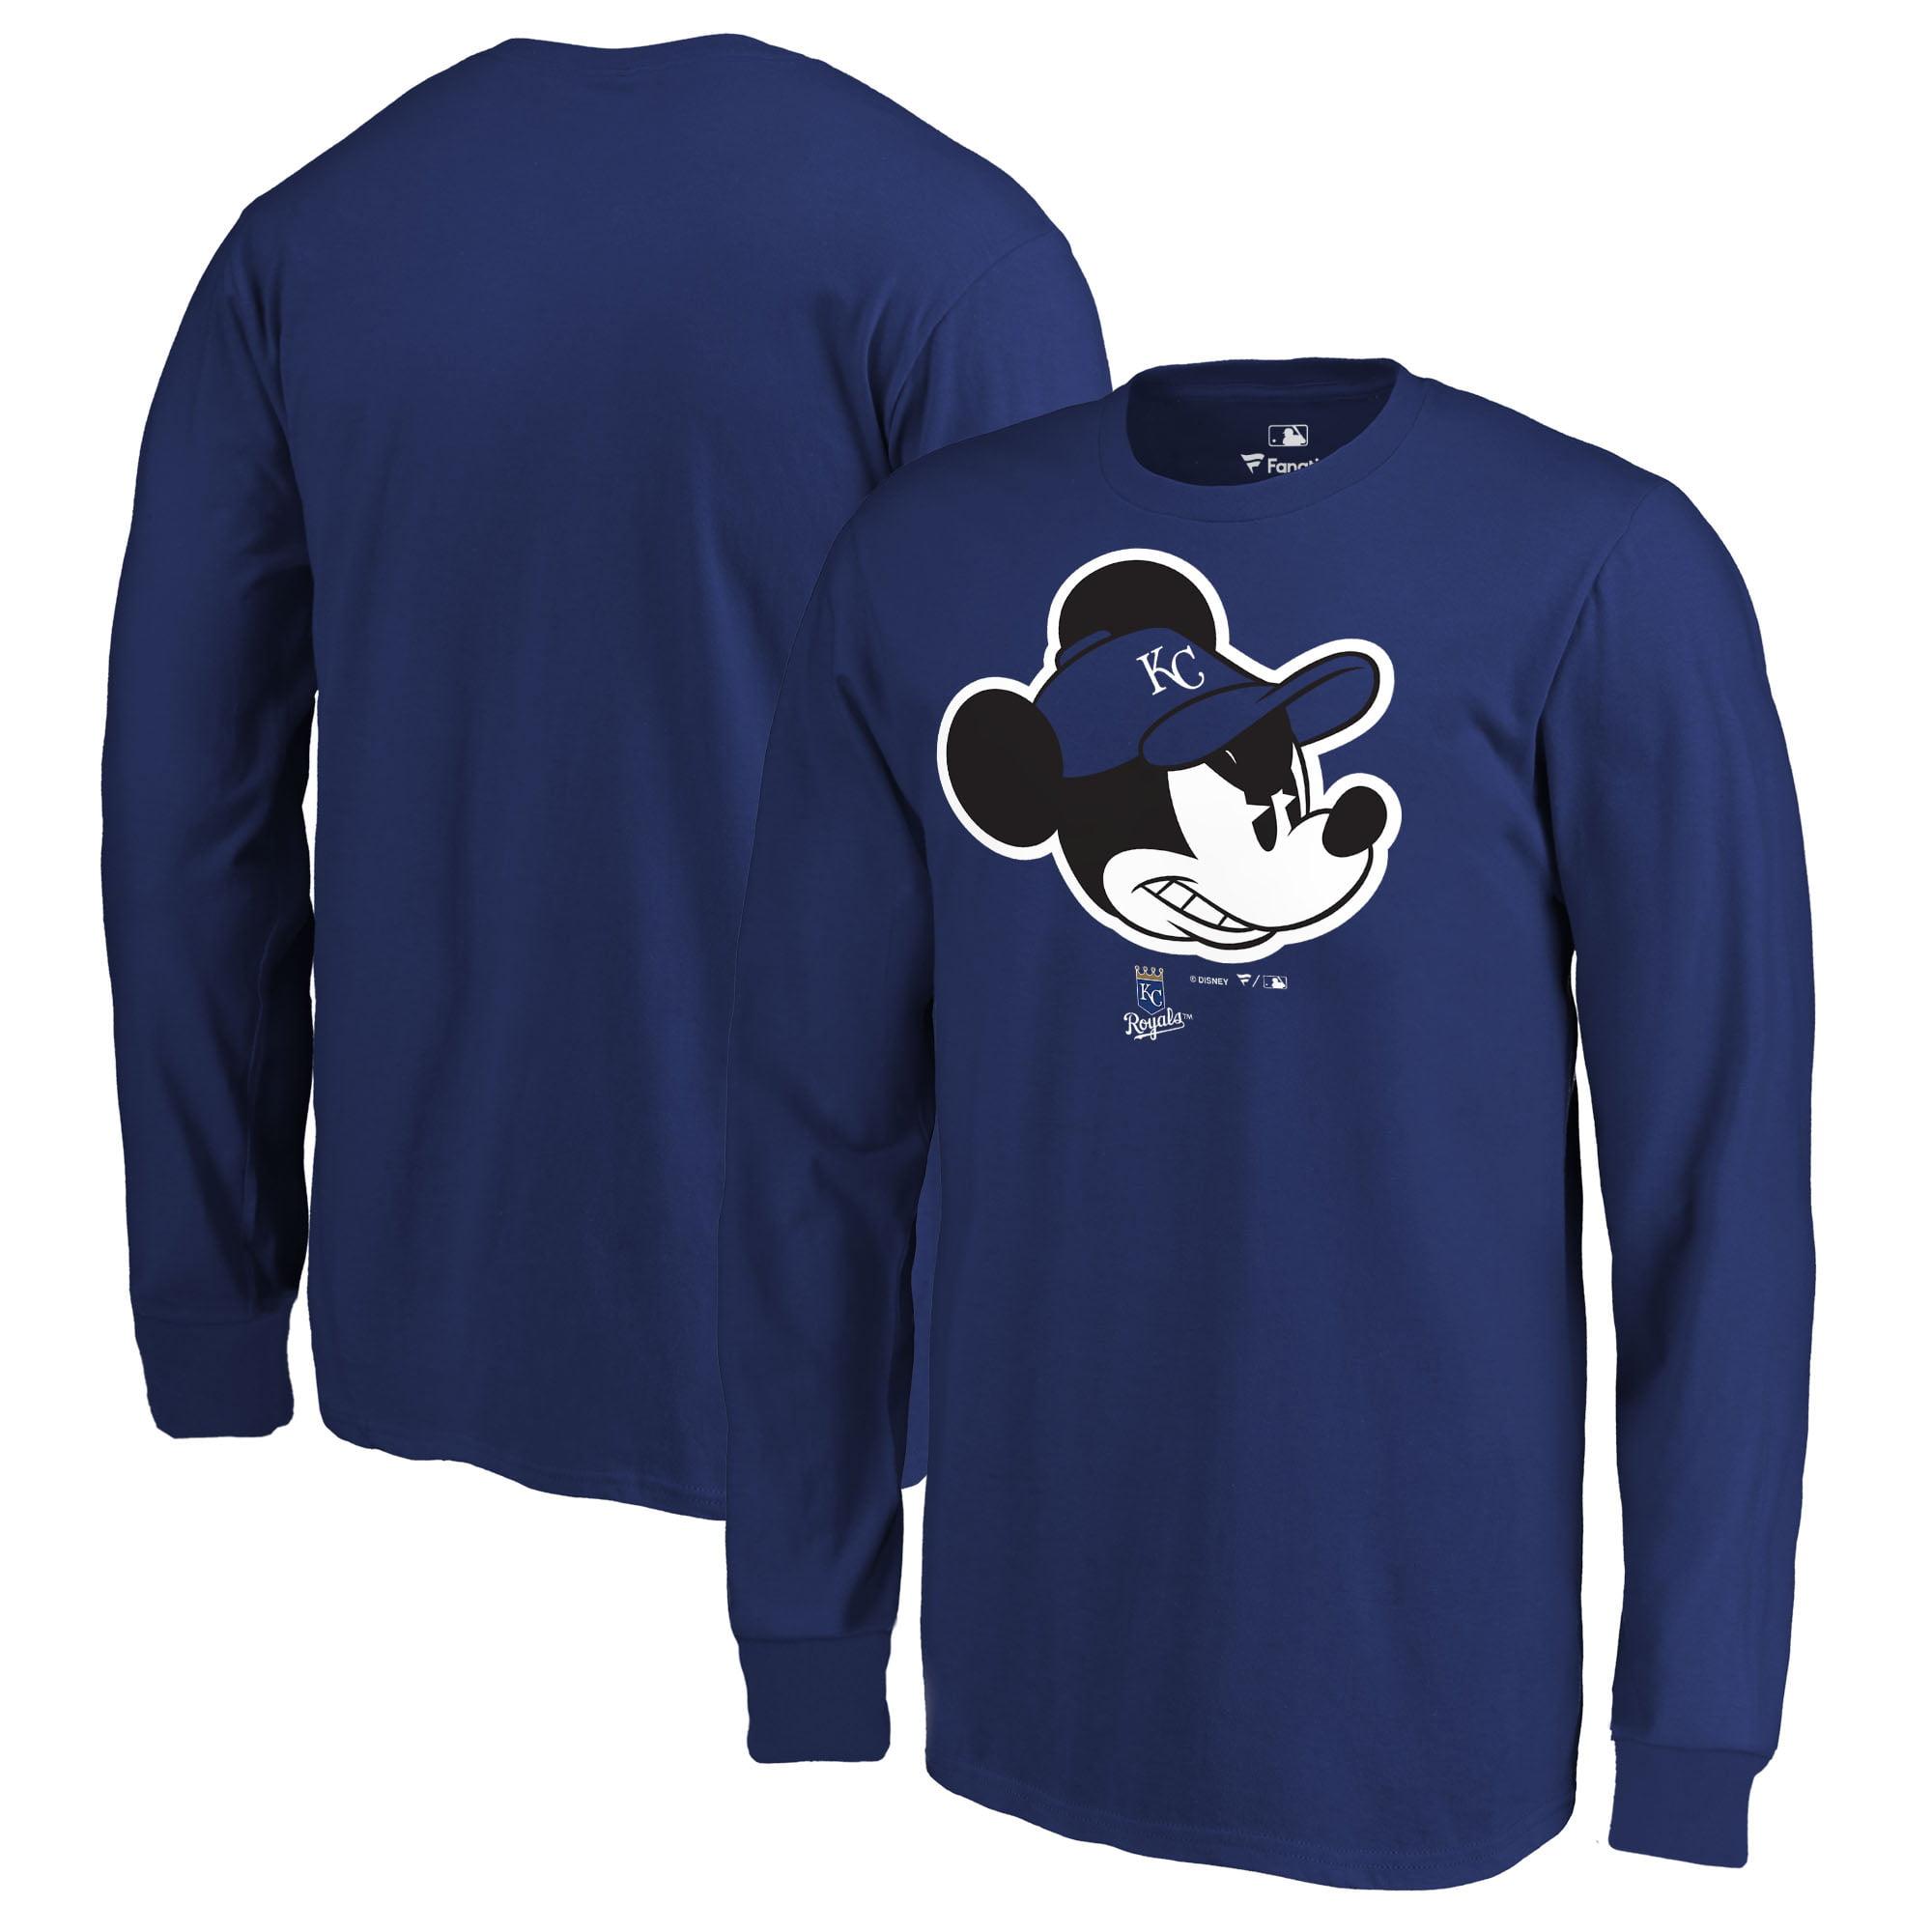 Kansas City Royals Fanatics Branded Youth Disney Game Face Long Sleeve T-Shirt - Royal